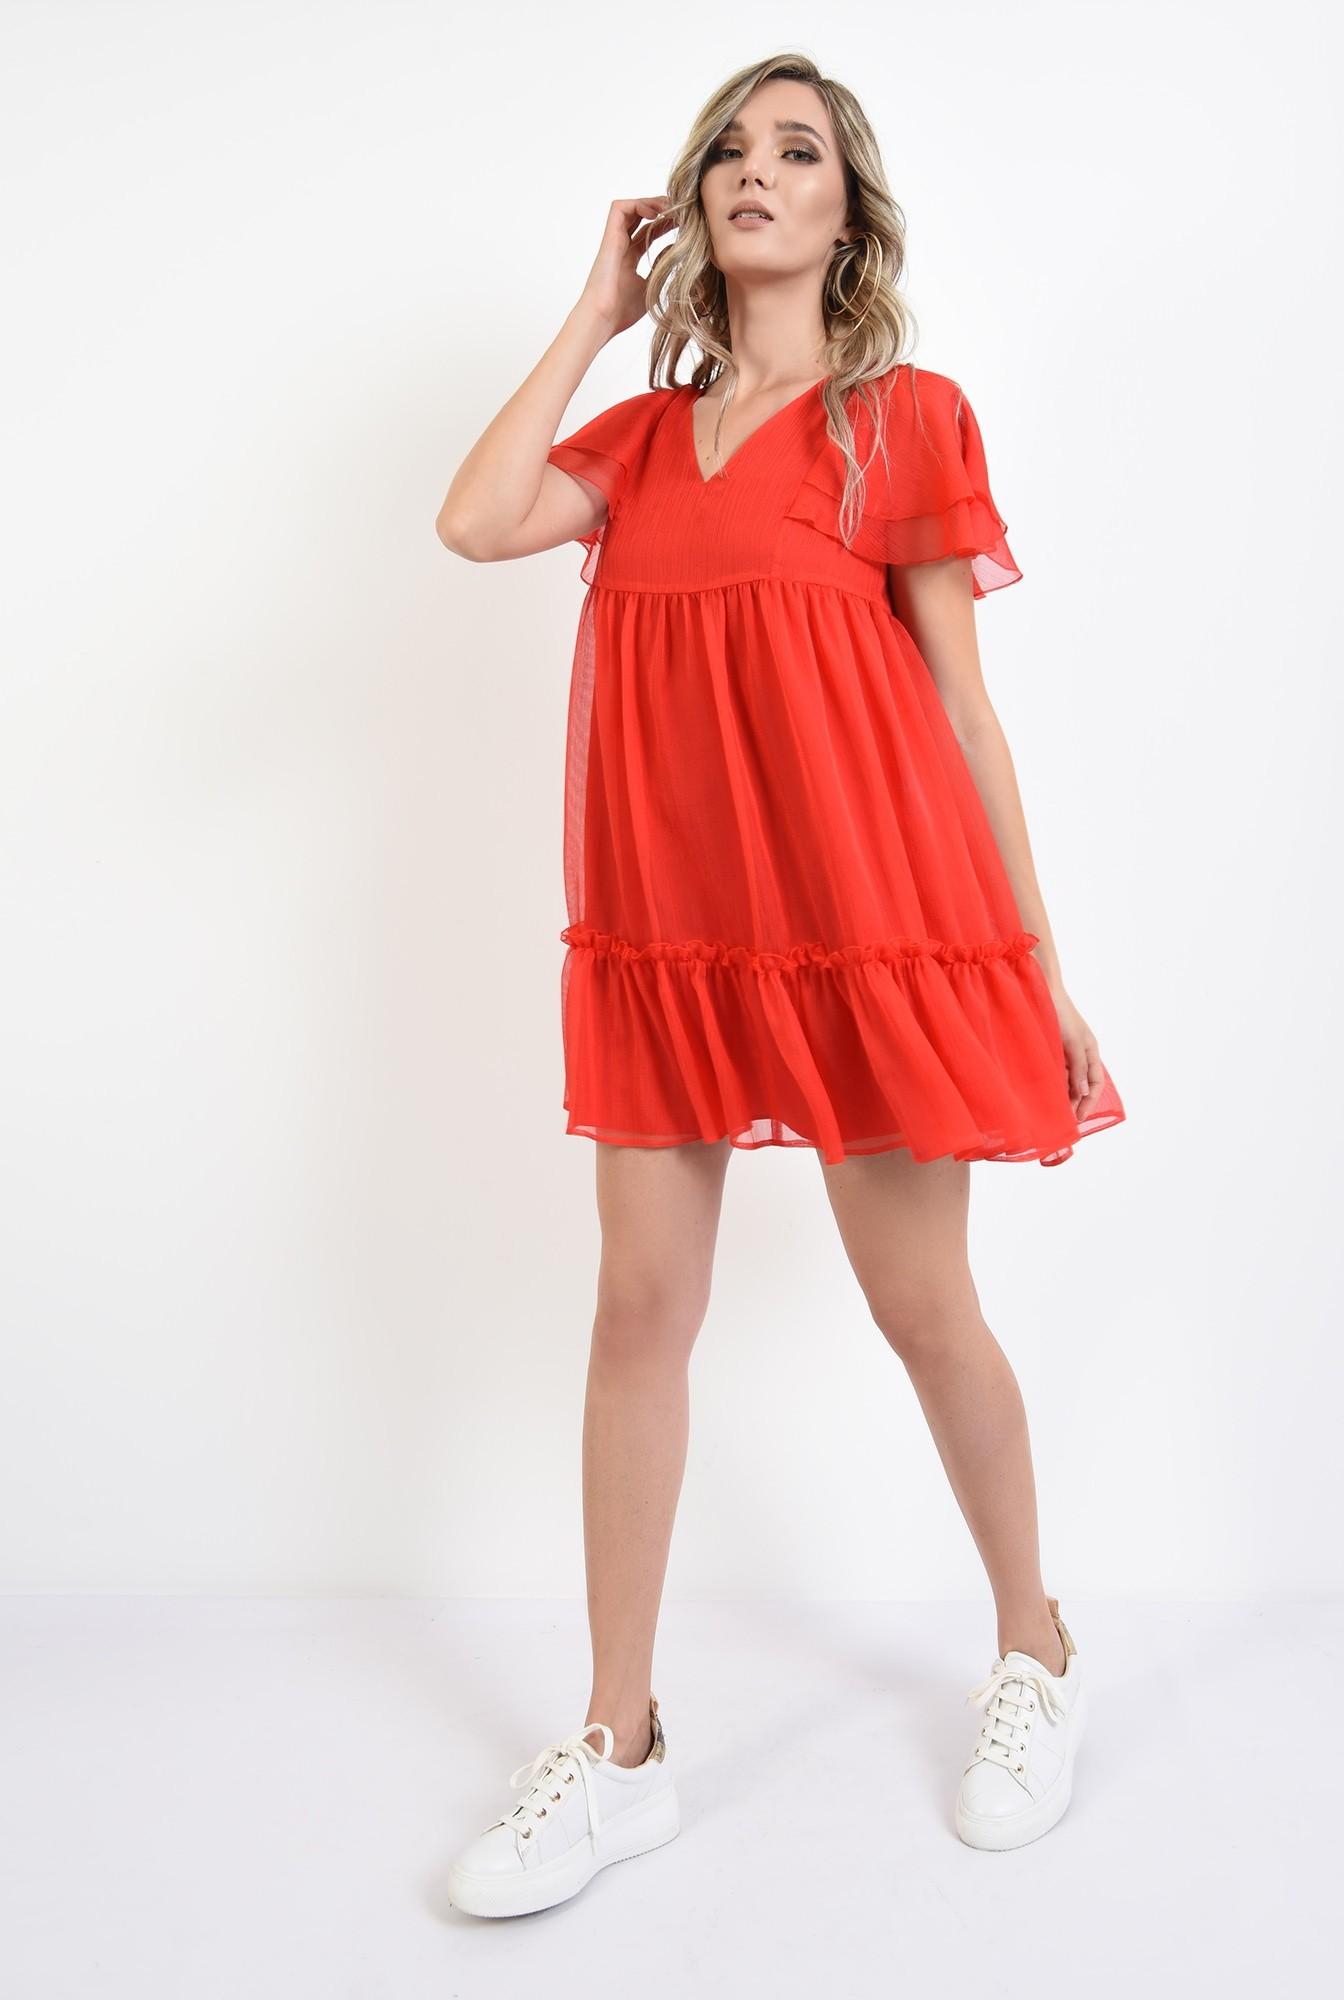 360 - rochie scurta, de vara, rosie, cu volane, Poema